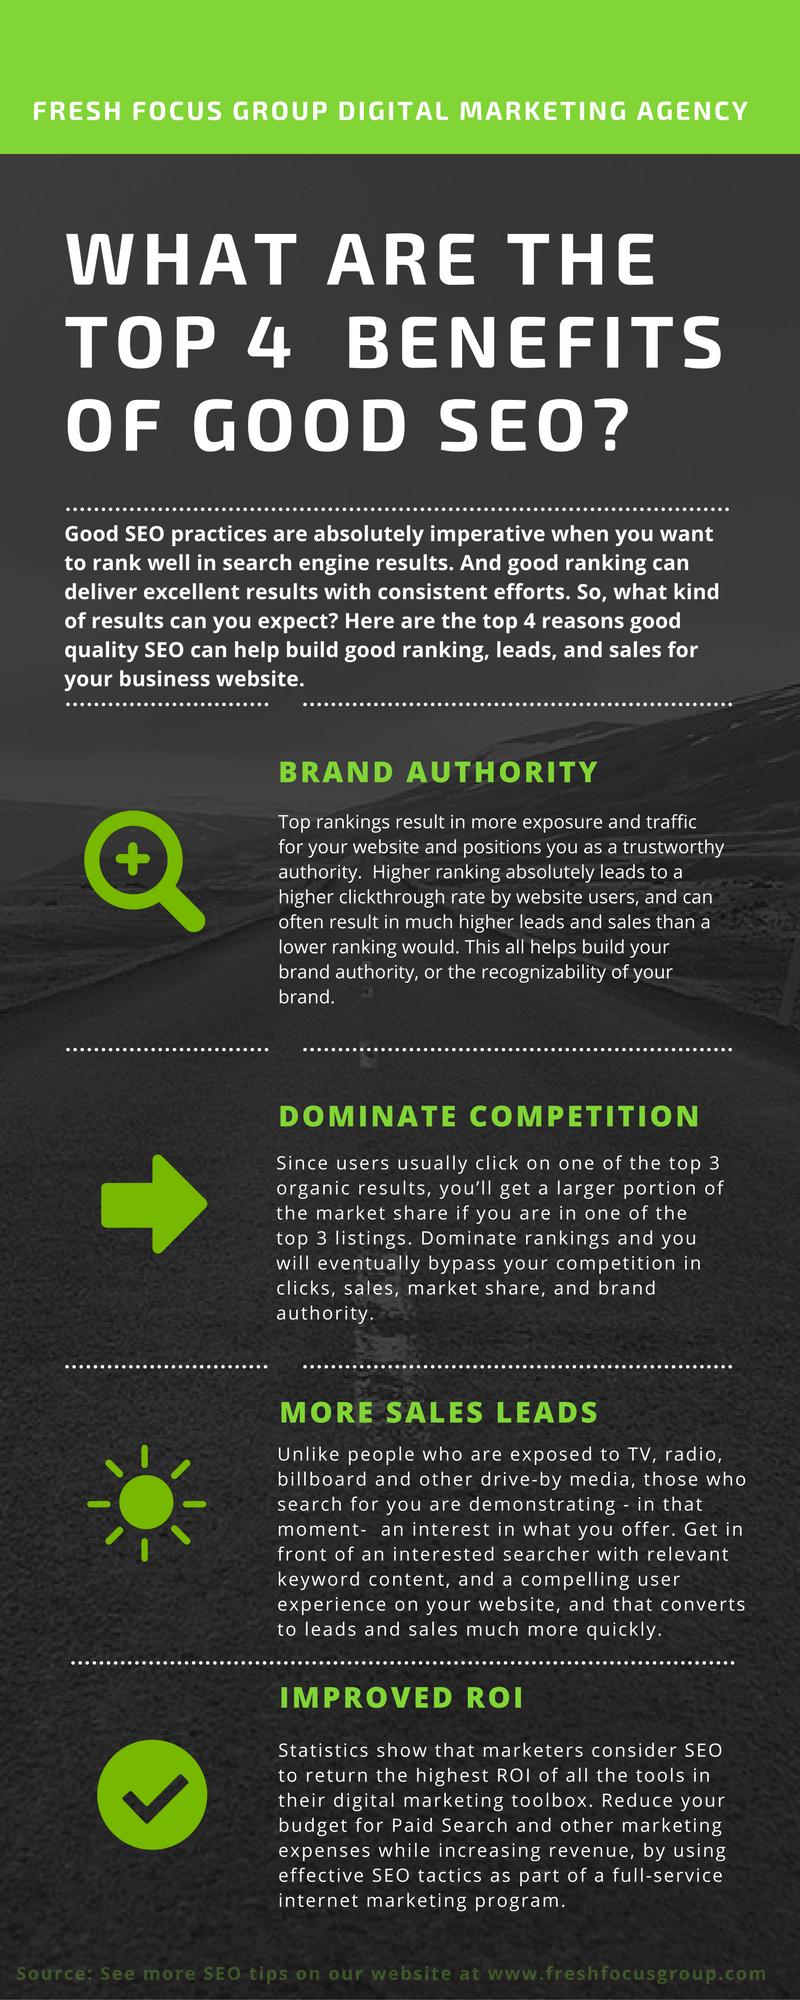 Benefits of good SEO Infographic